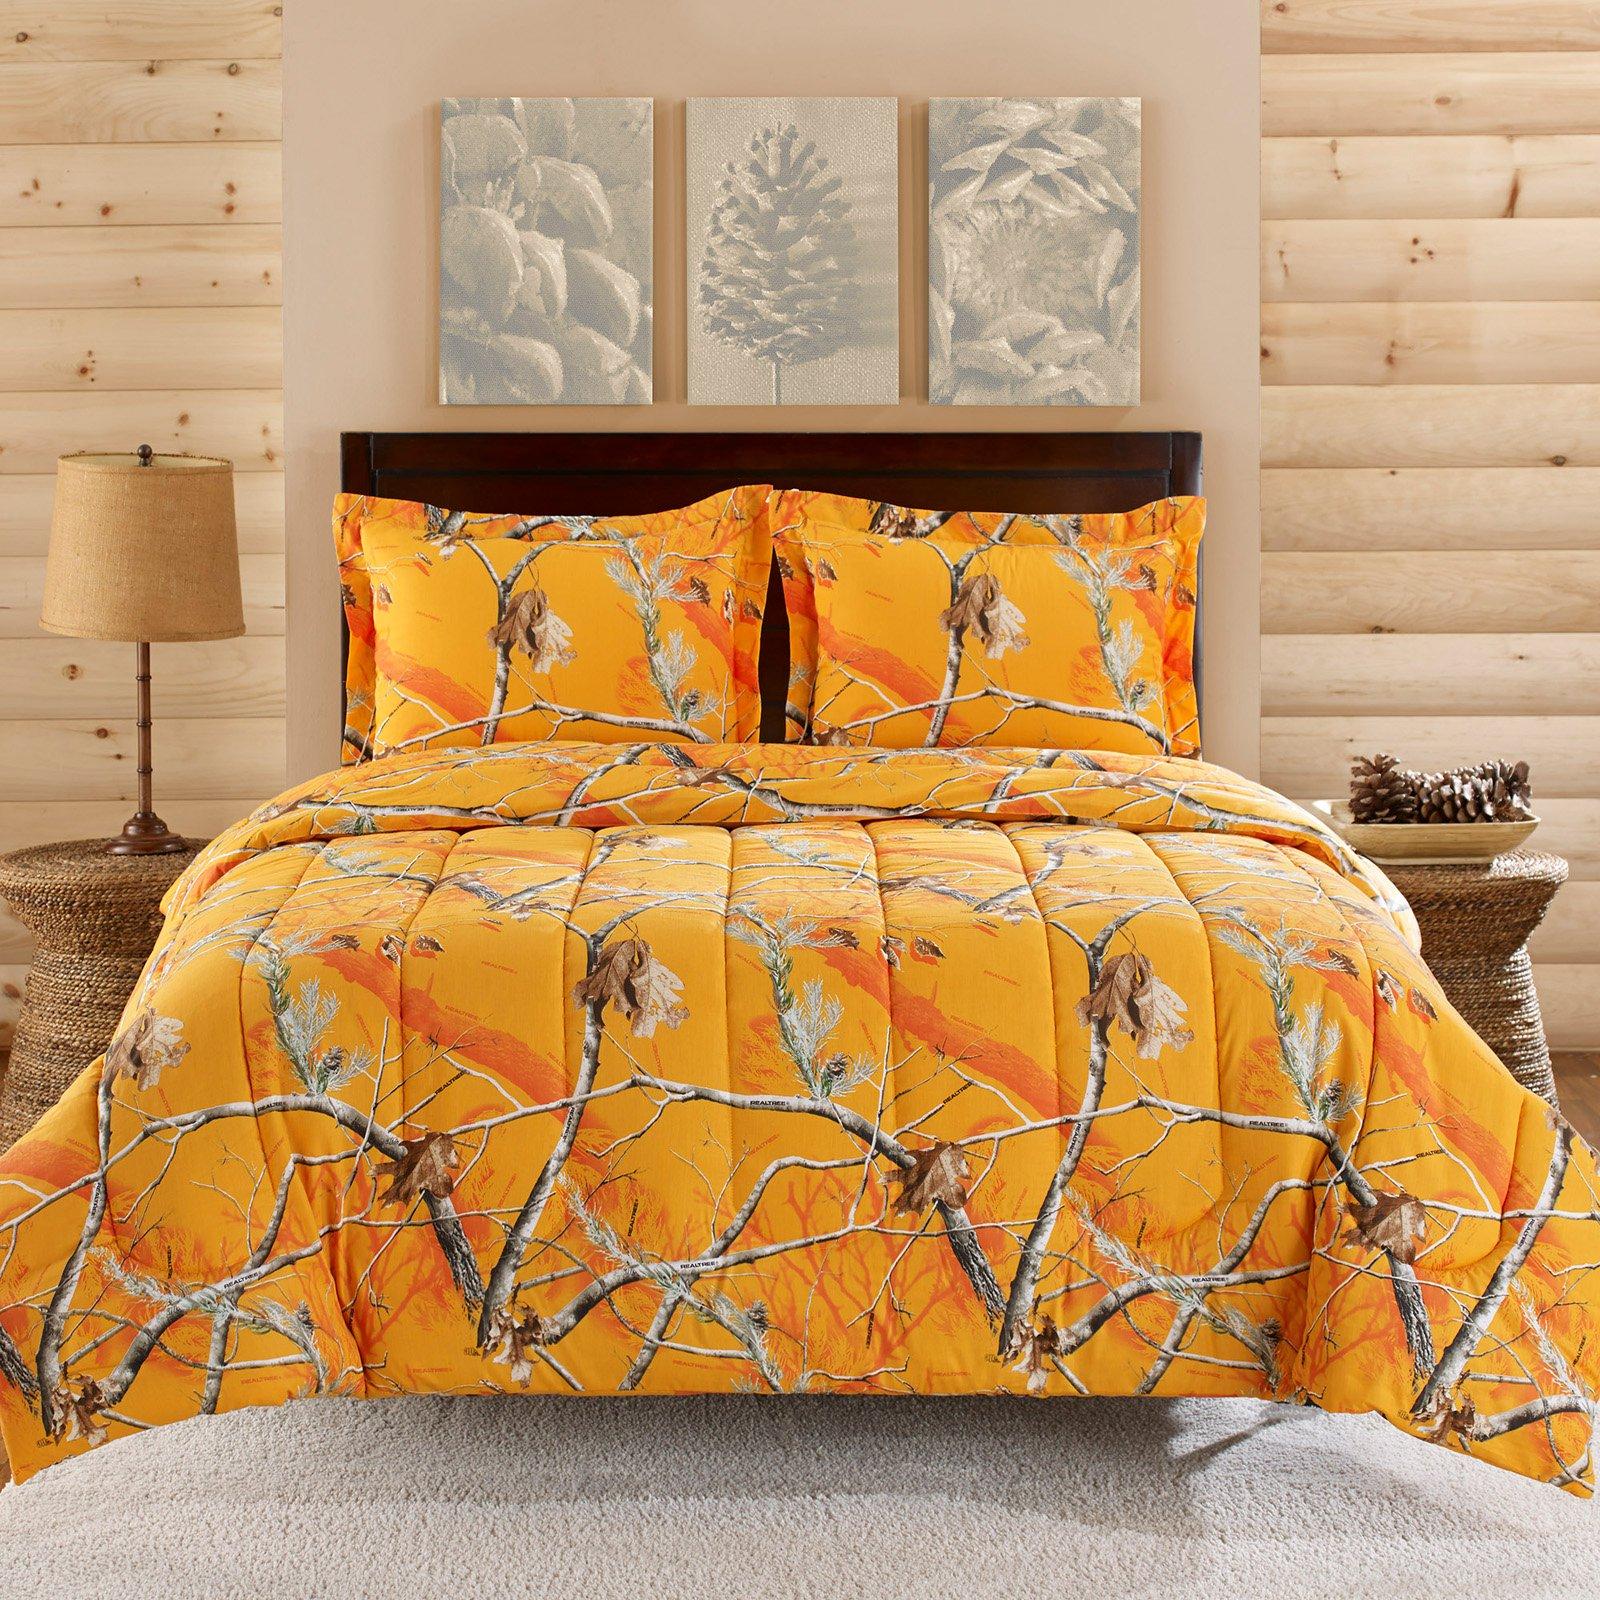 Realtree Bedding Comforter Set Walmartcom